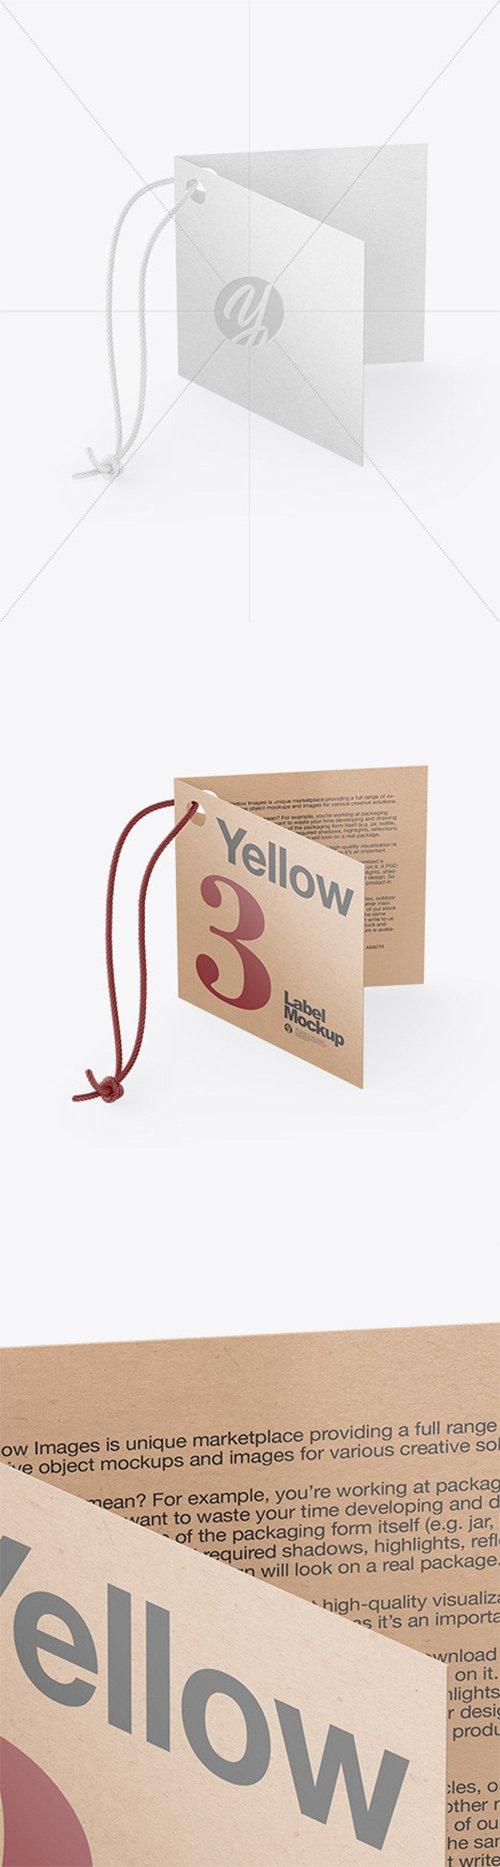 Kraft Folded Label With Rope Mockup 66562 TIF